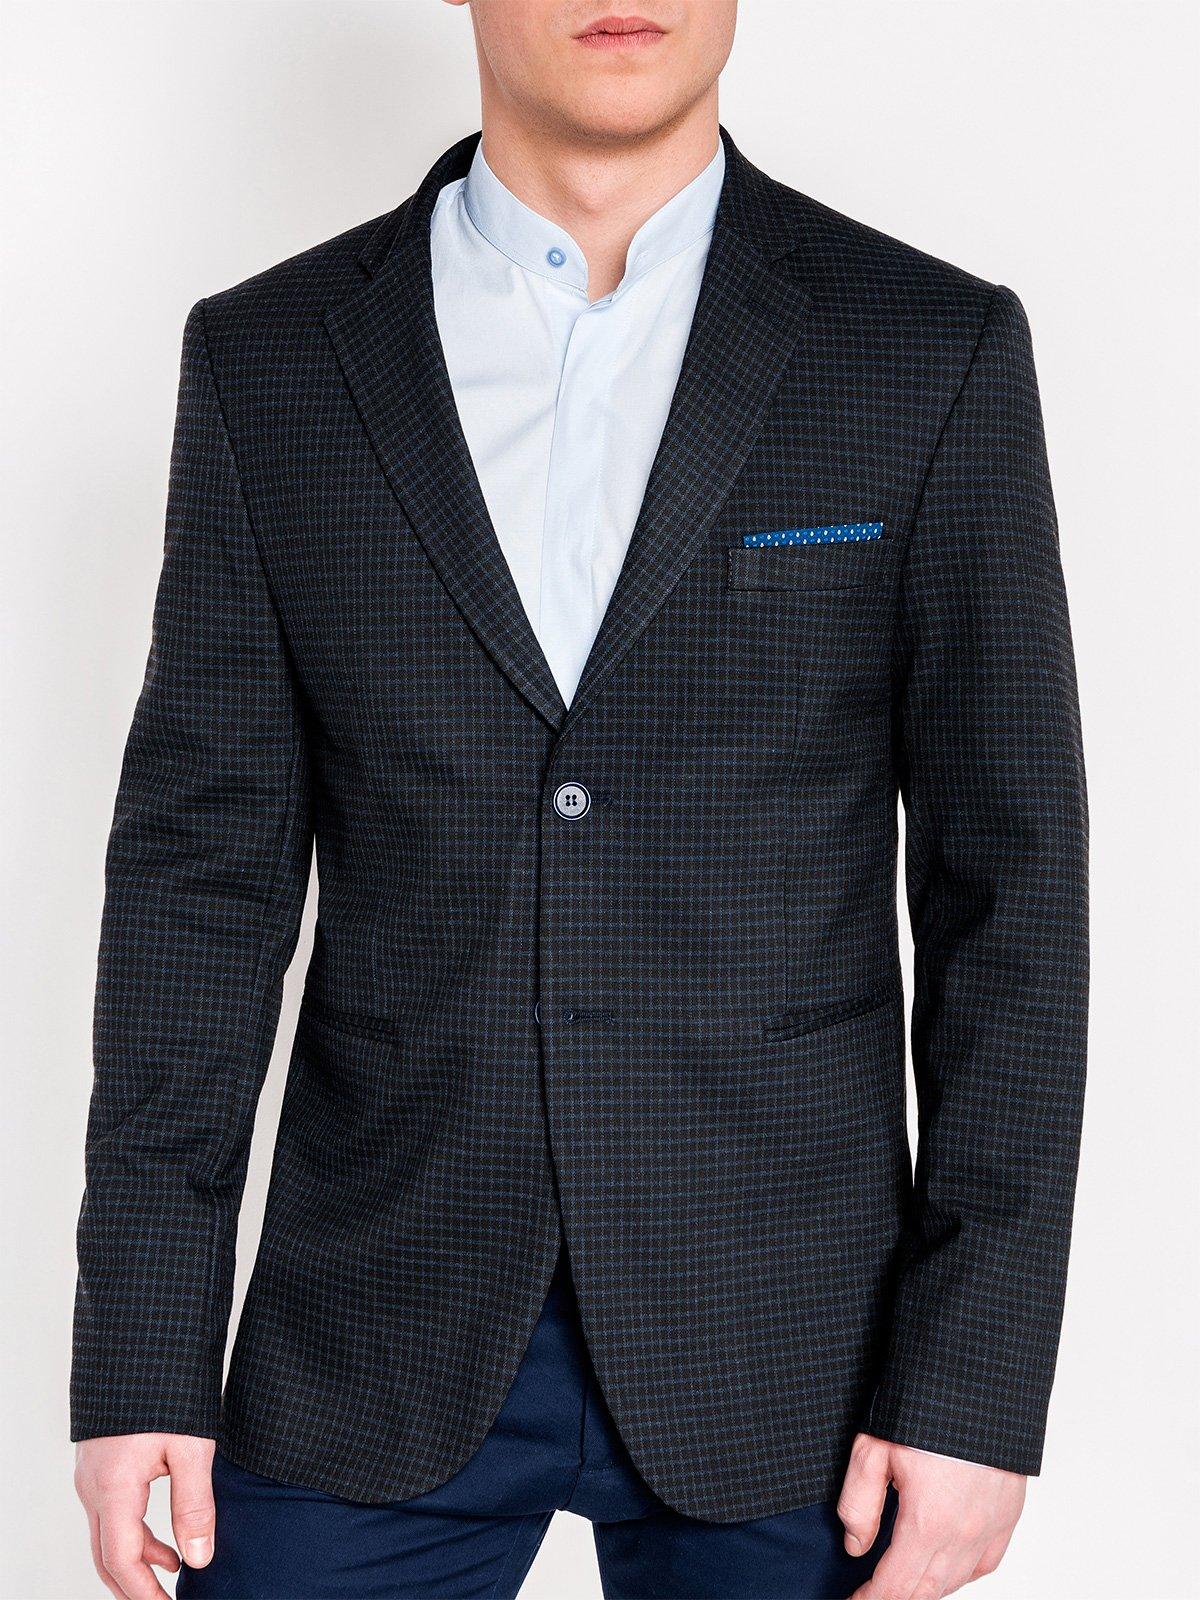 Ombre Clothing Men's elegant blazer jacket M108